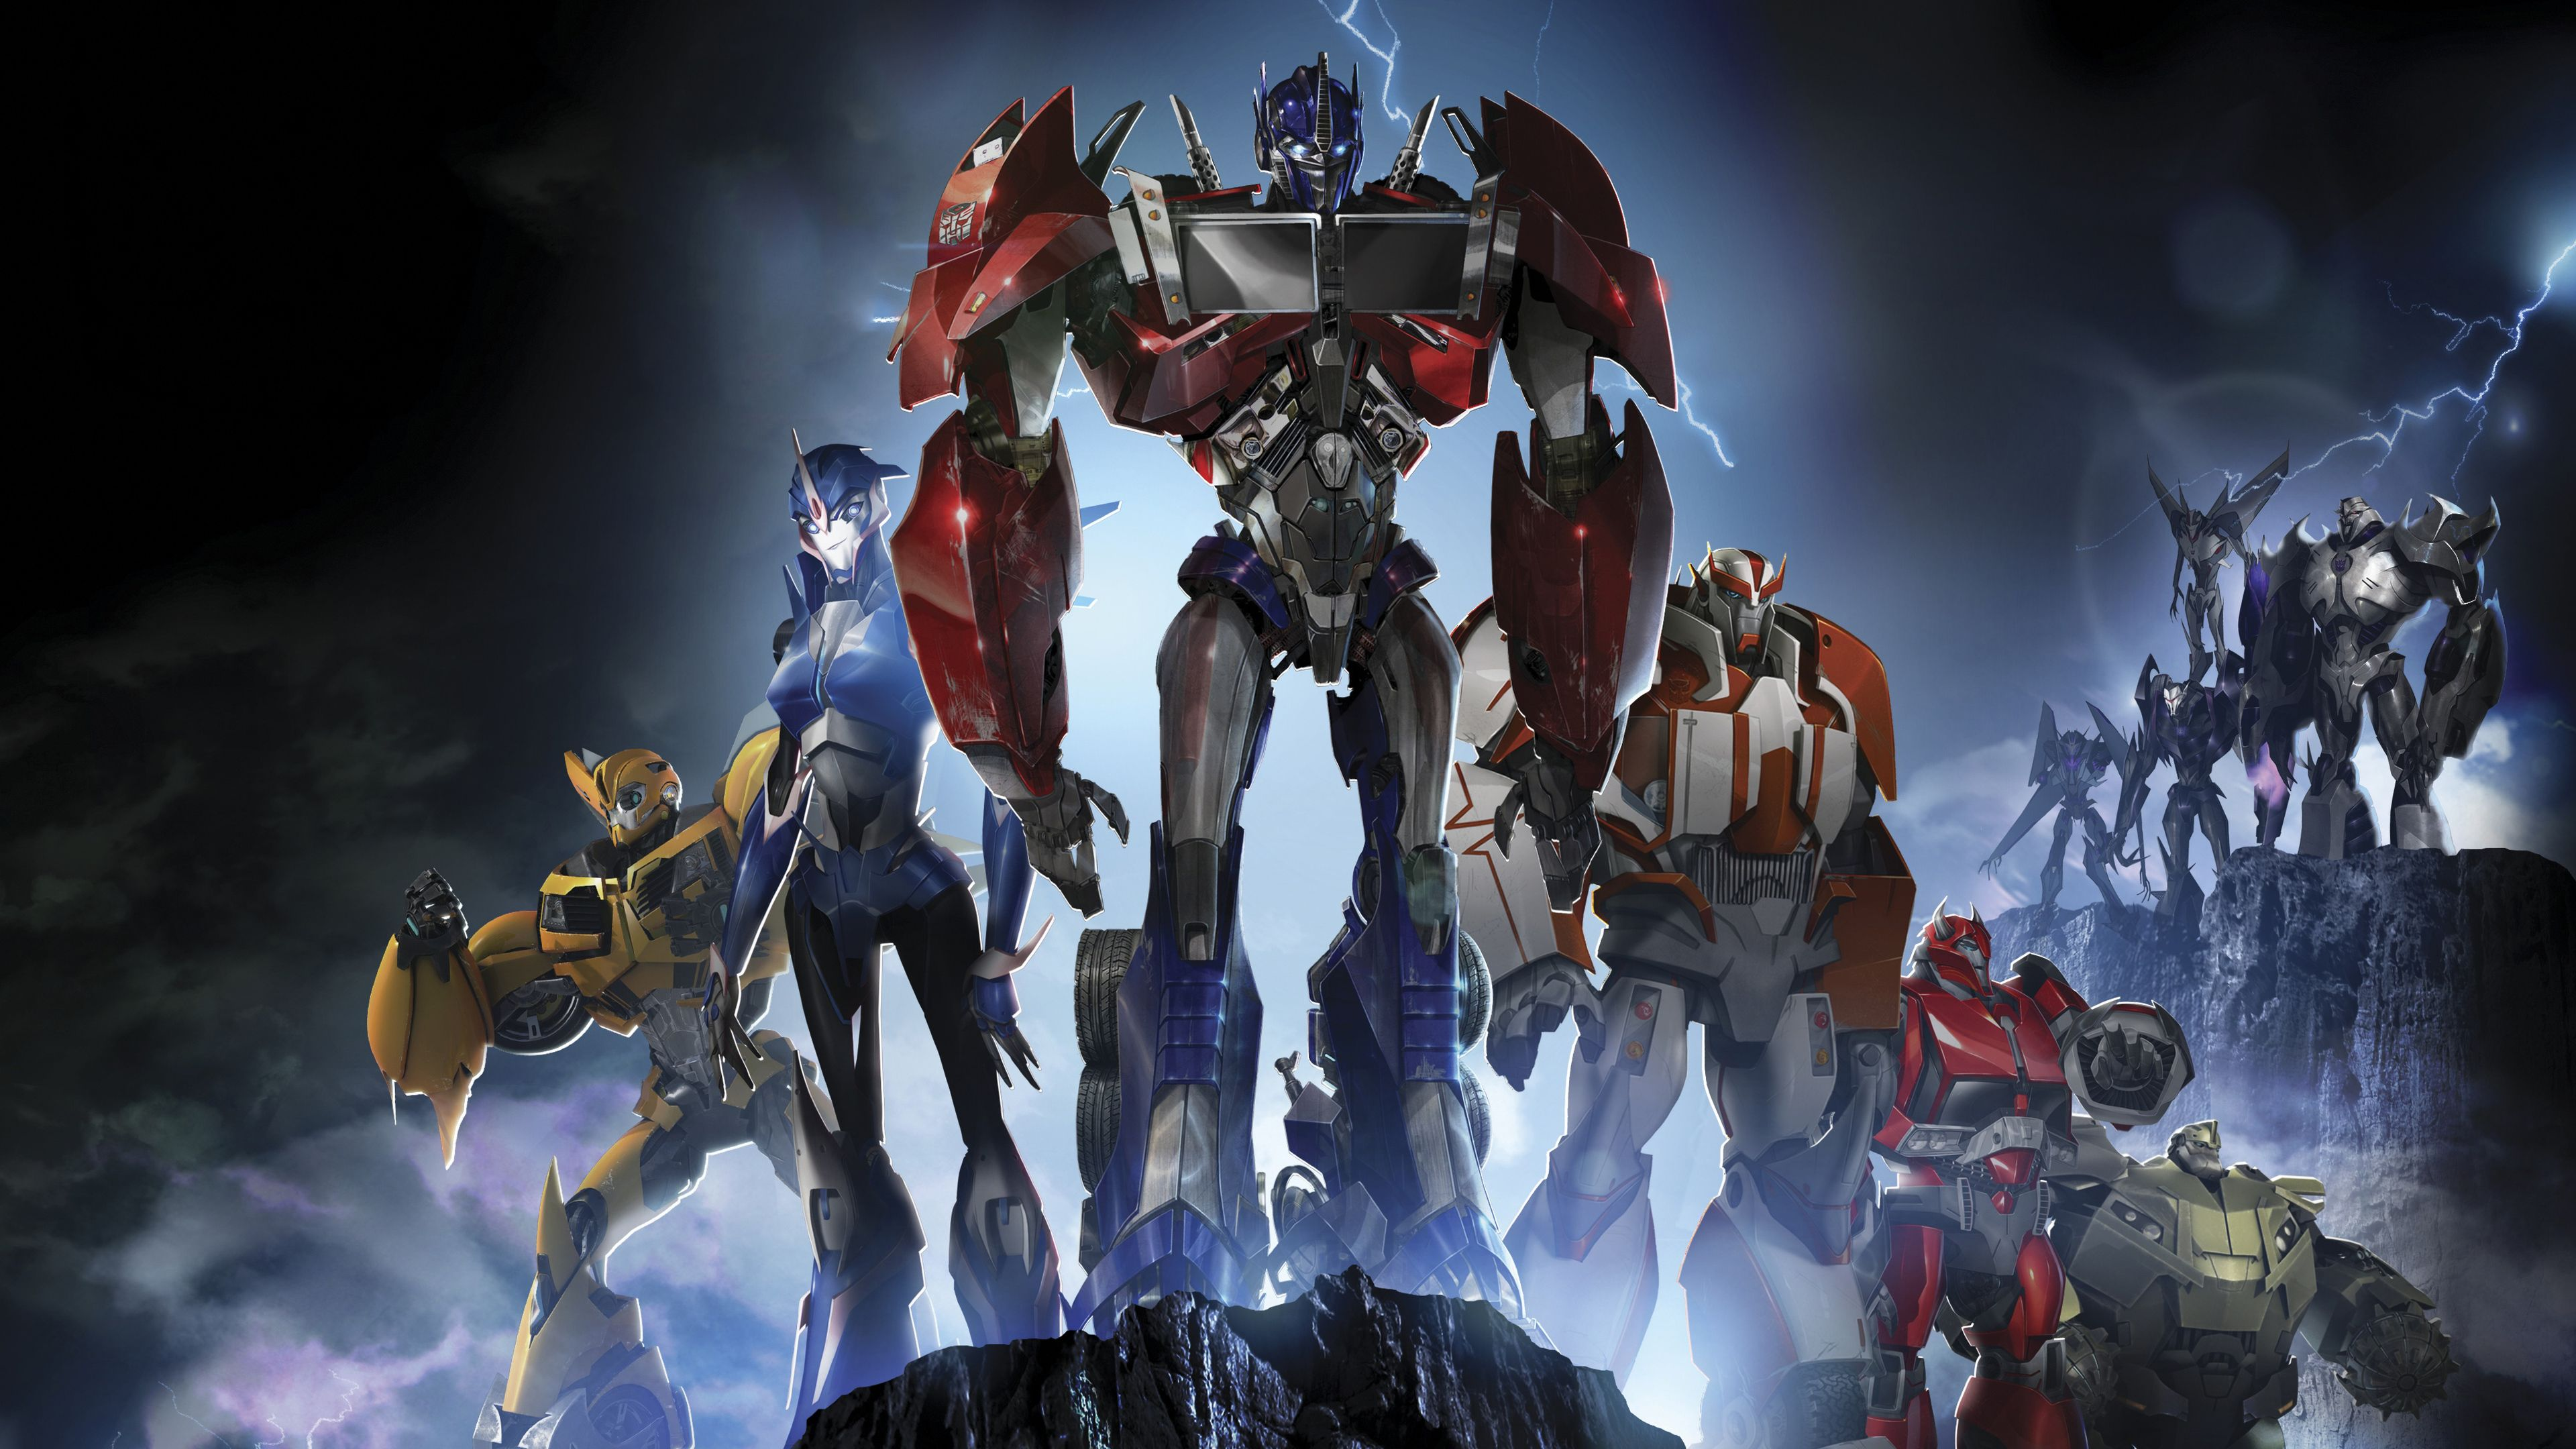 Transformers Prime 4k Transformers Wallpapers Hd Wallpapers 4k Wallpapers Transformers Prime Transformers Transformer Birthday